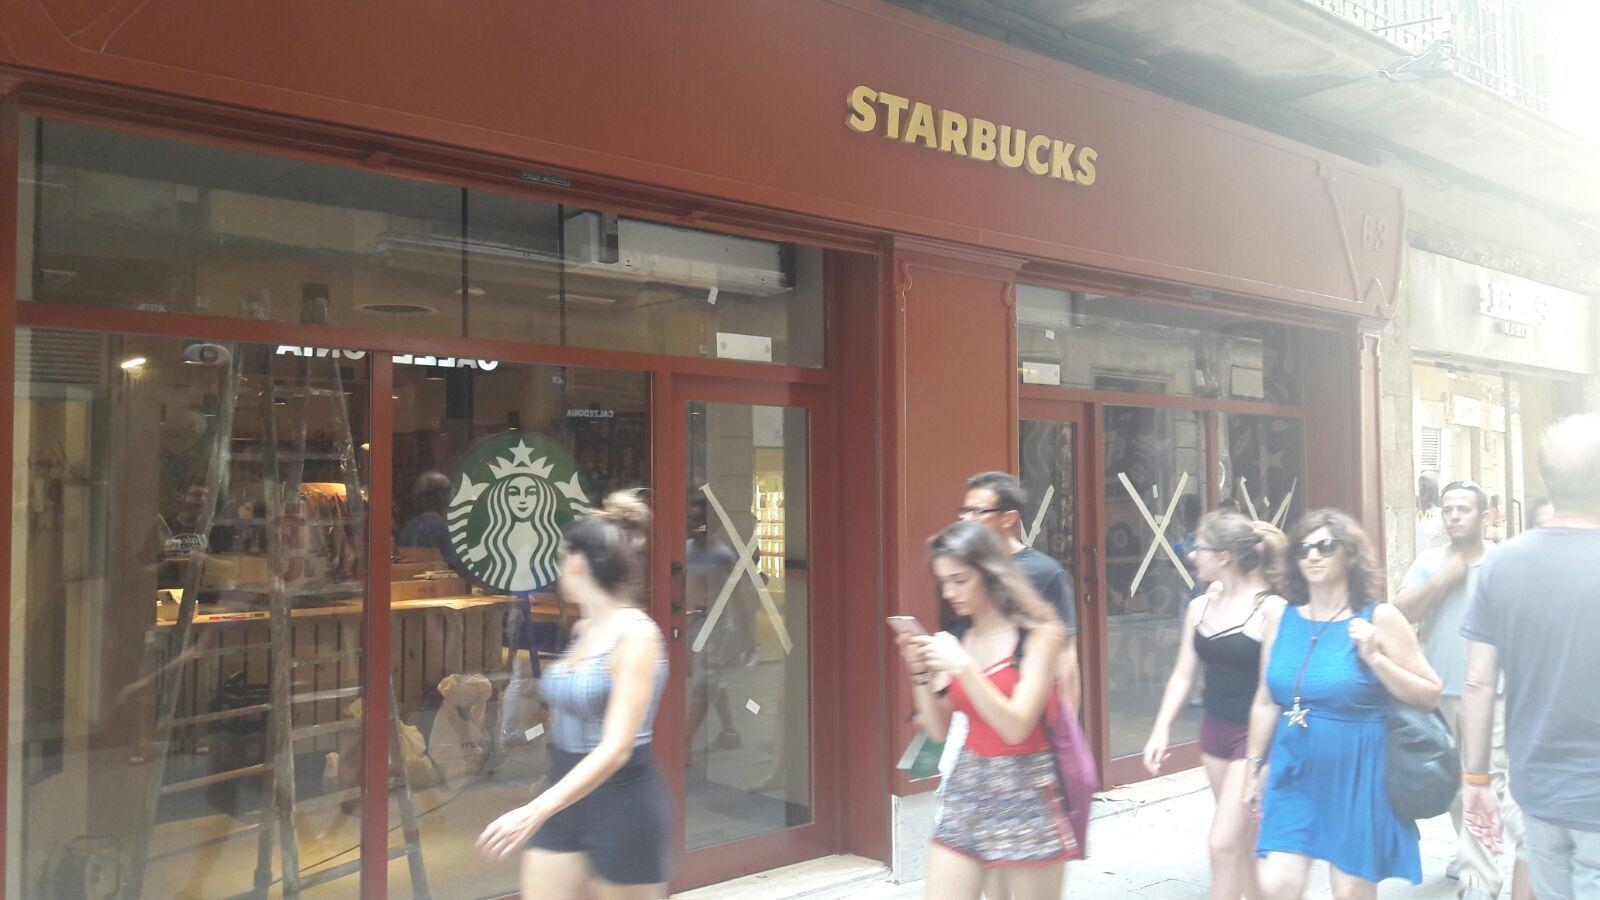 De granja modernista a Starbucks